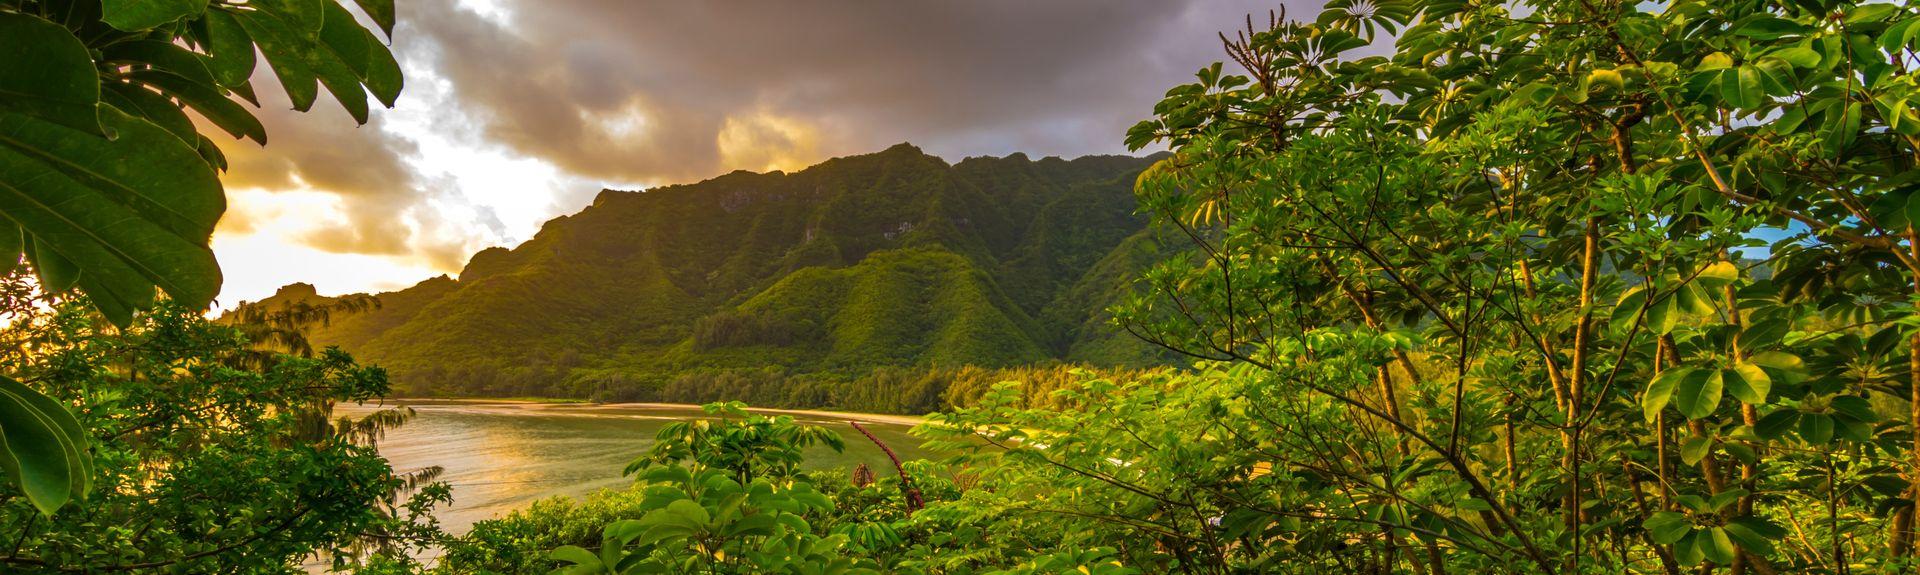 Kahana (Maui), Lahaina, HI, USA